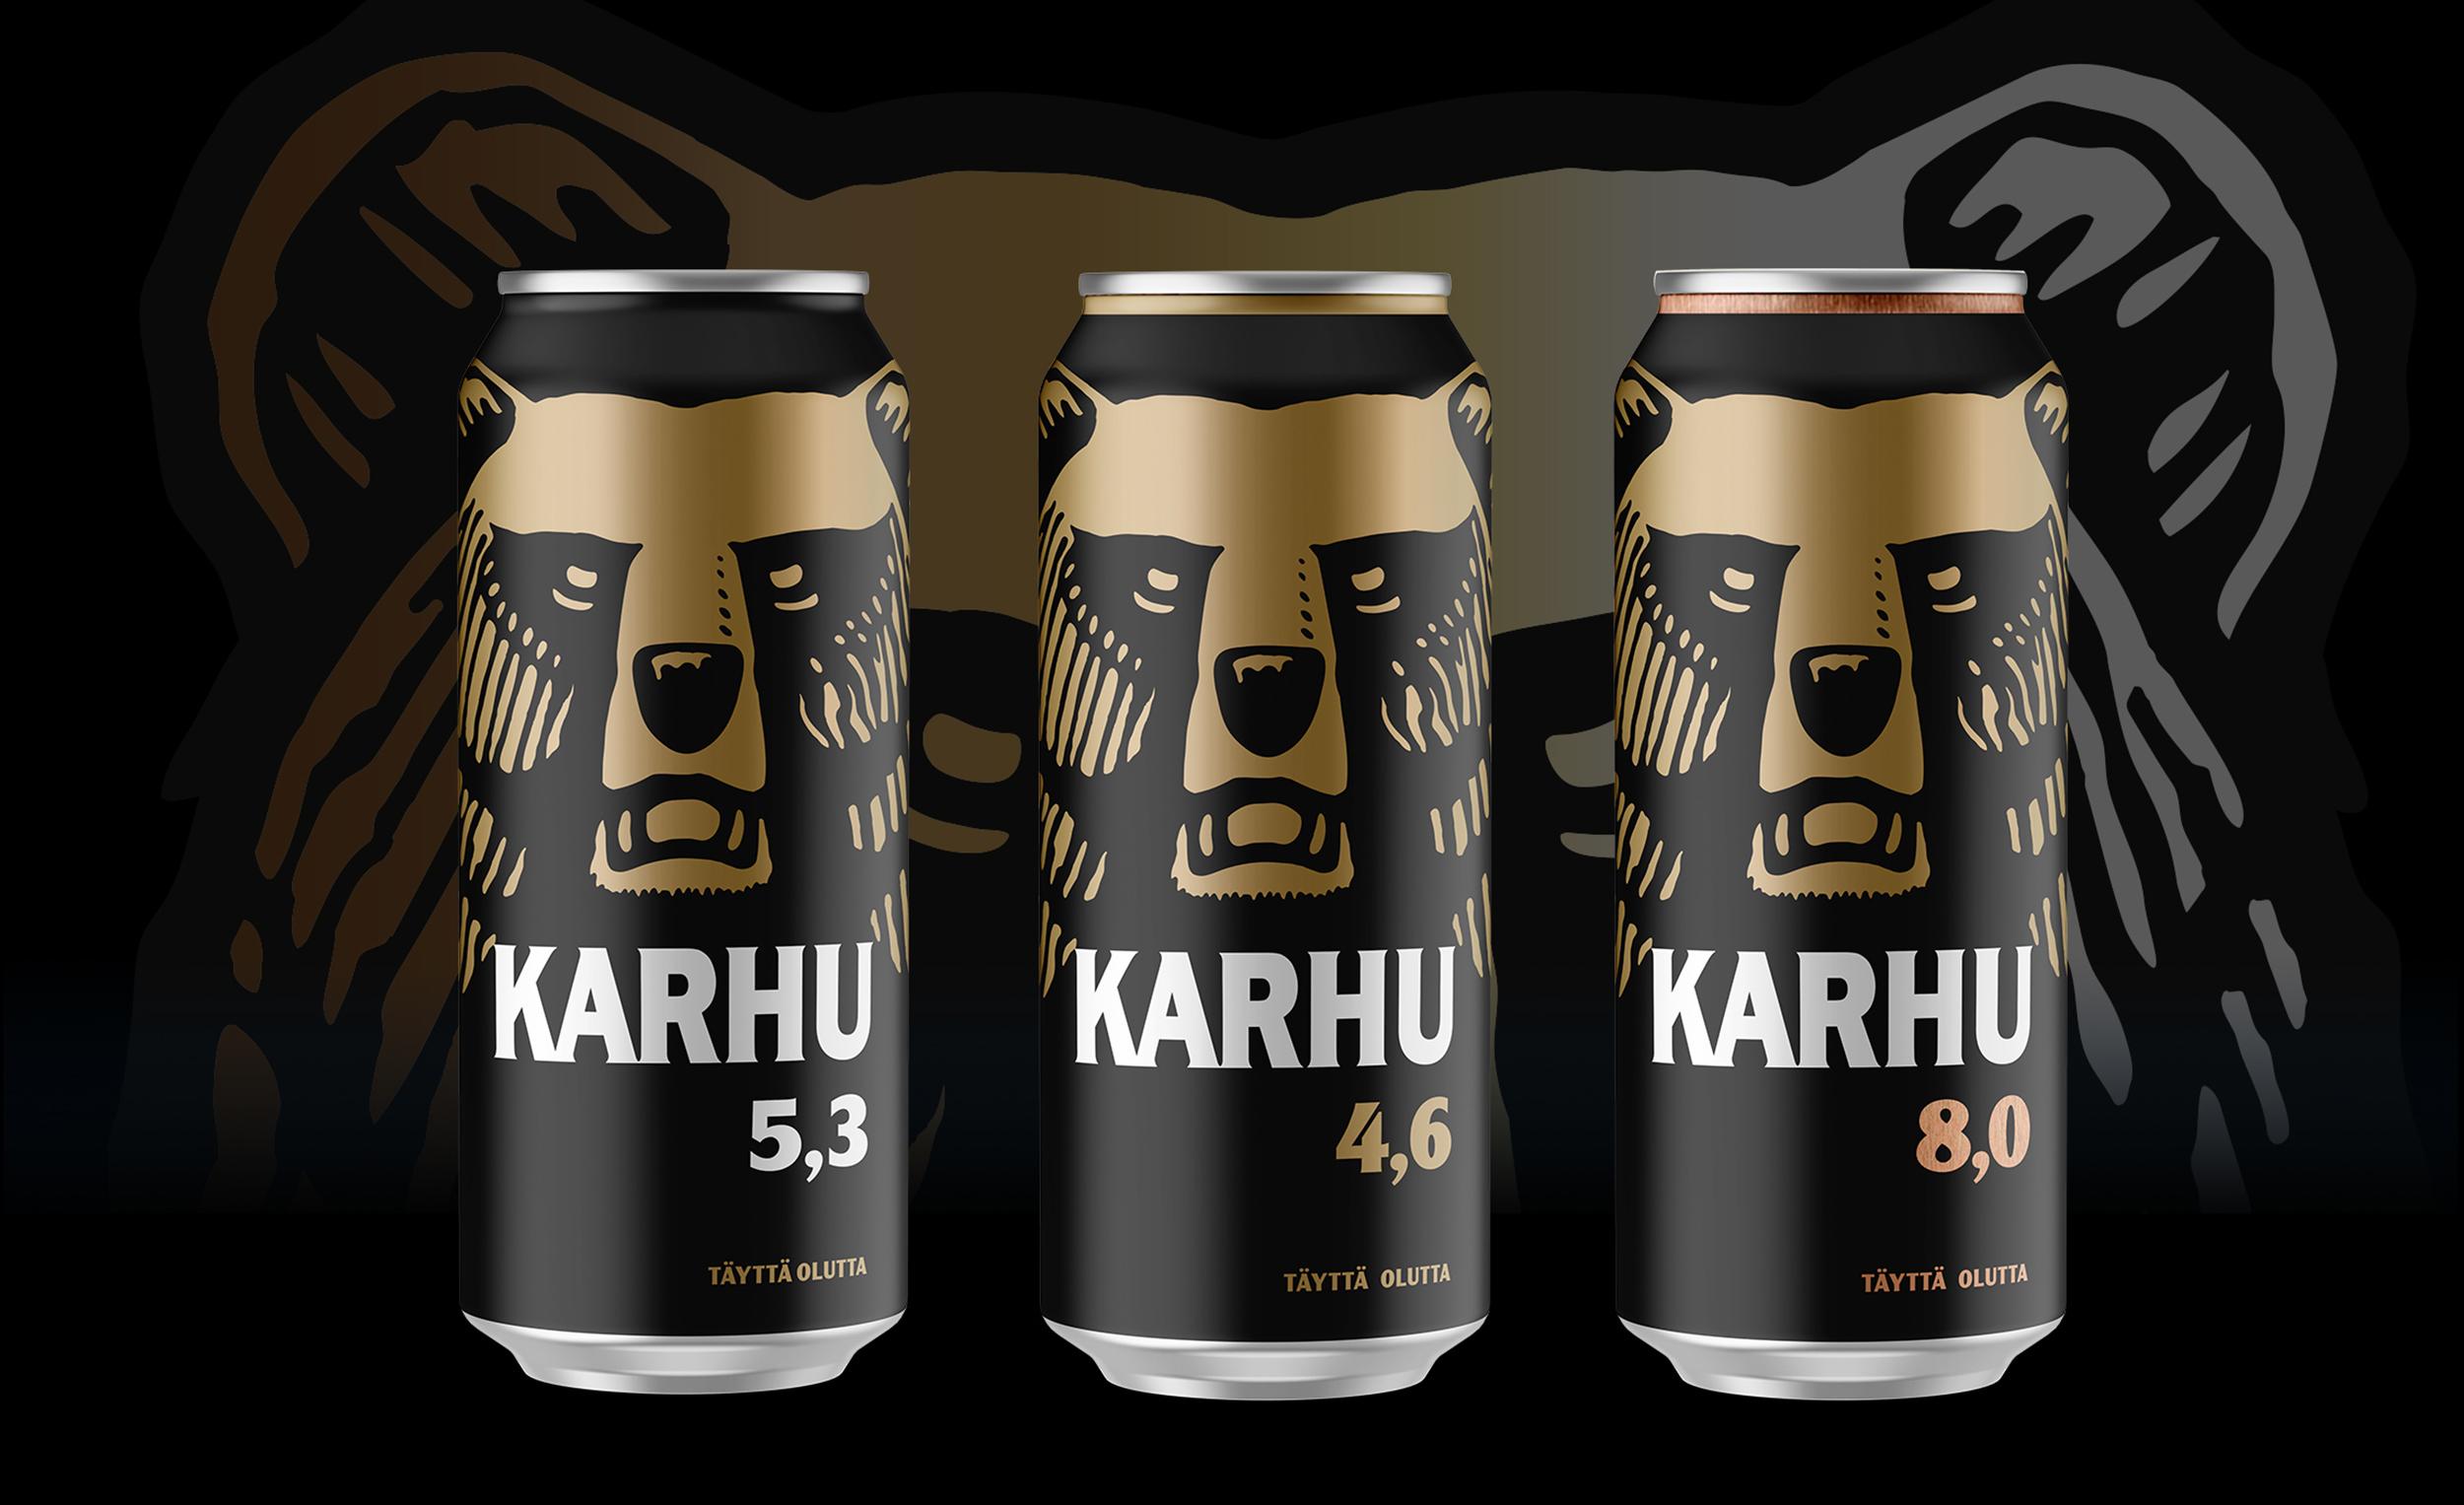 Karhu Authenticity